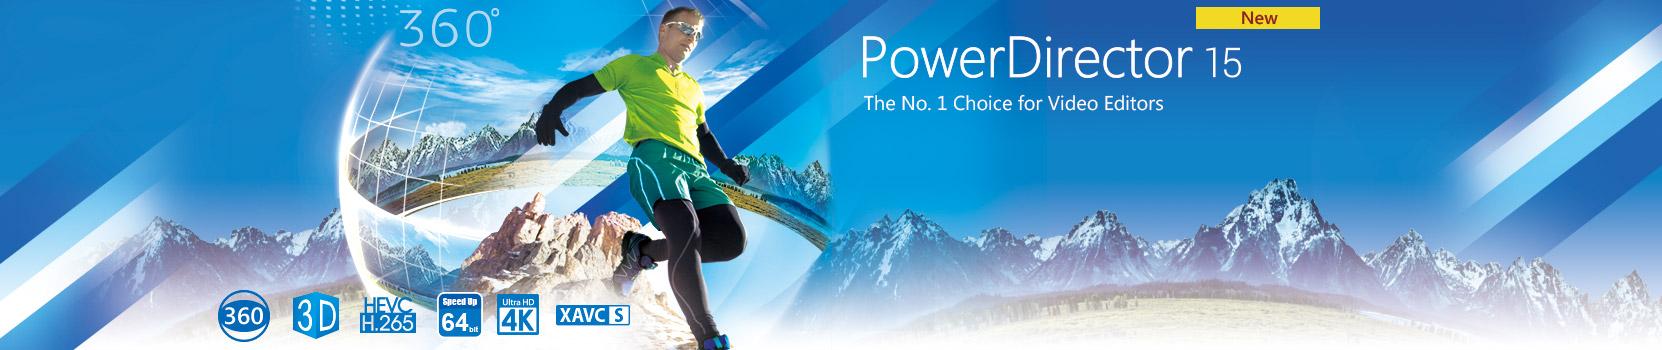 download CyberLink.PowerDirector.Ultimate.v15.0.20.26.0.Incl.Keymaker-CORE